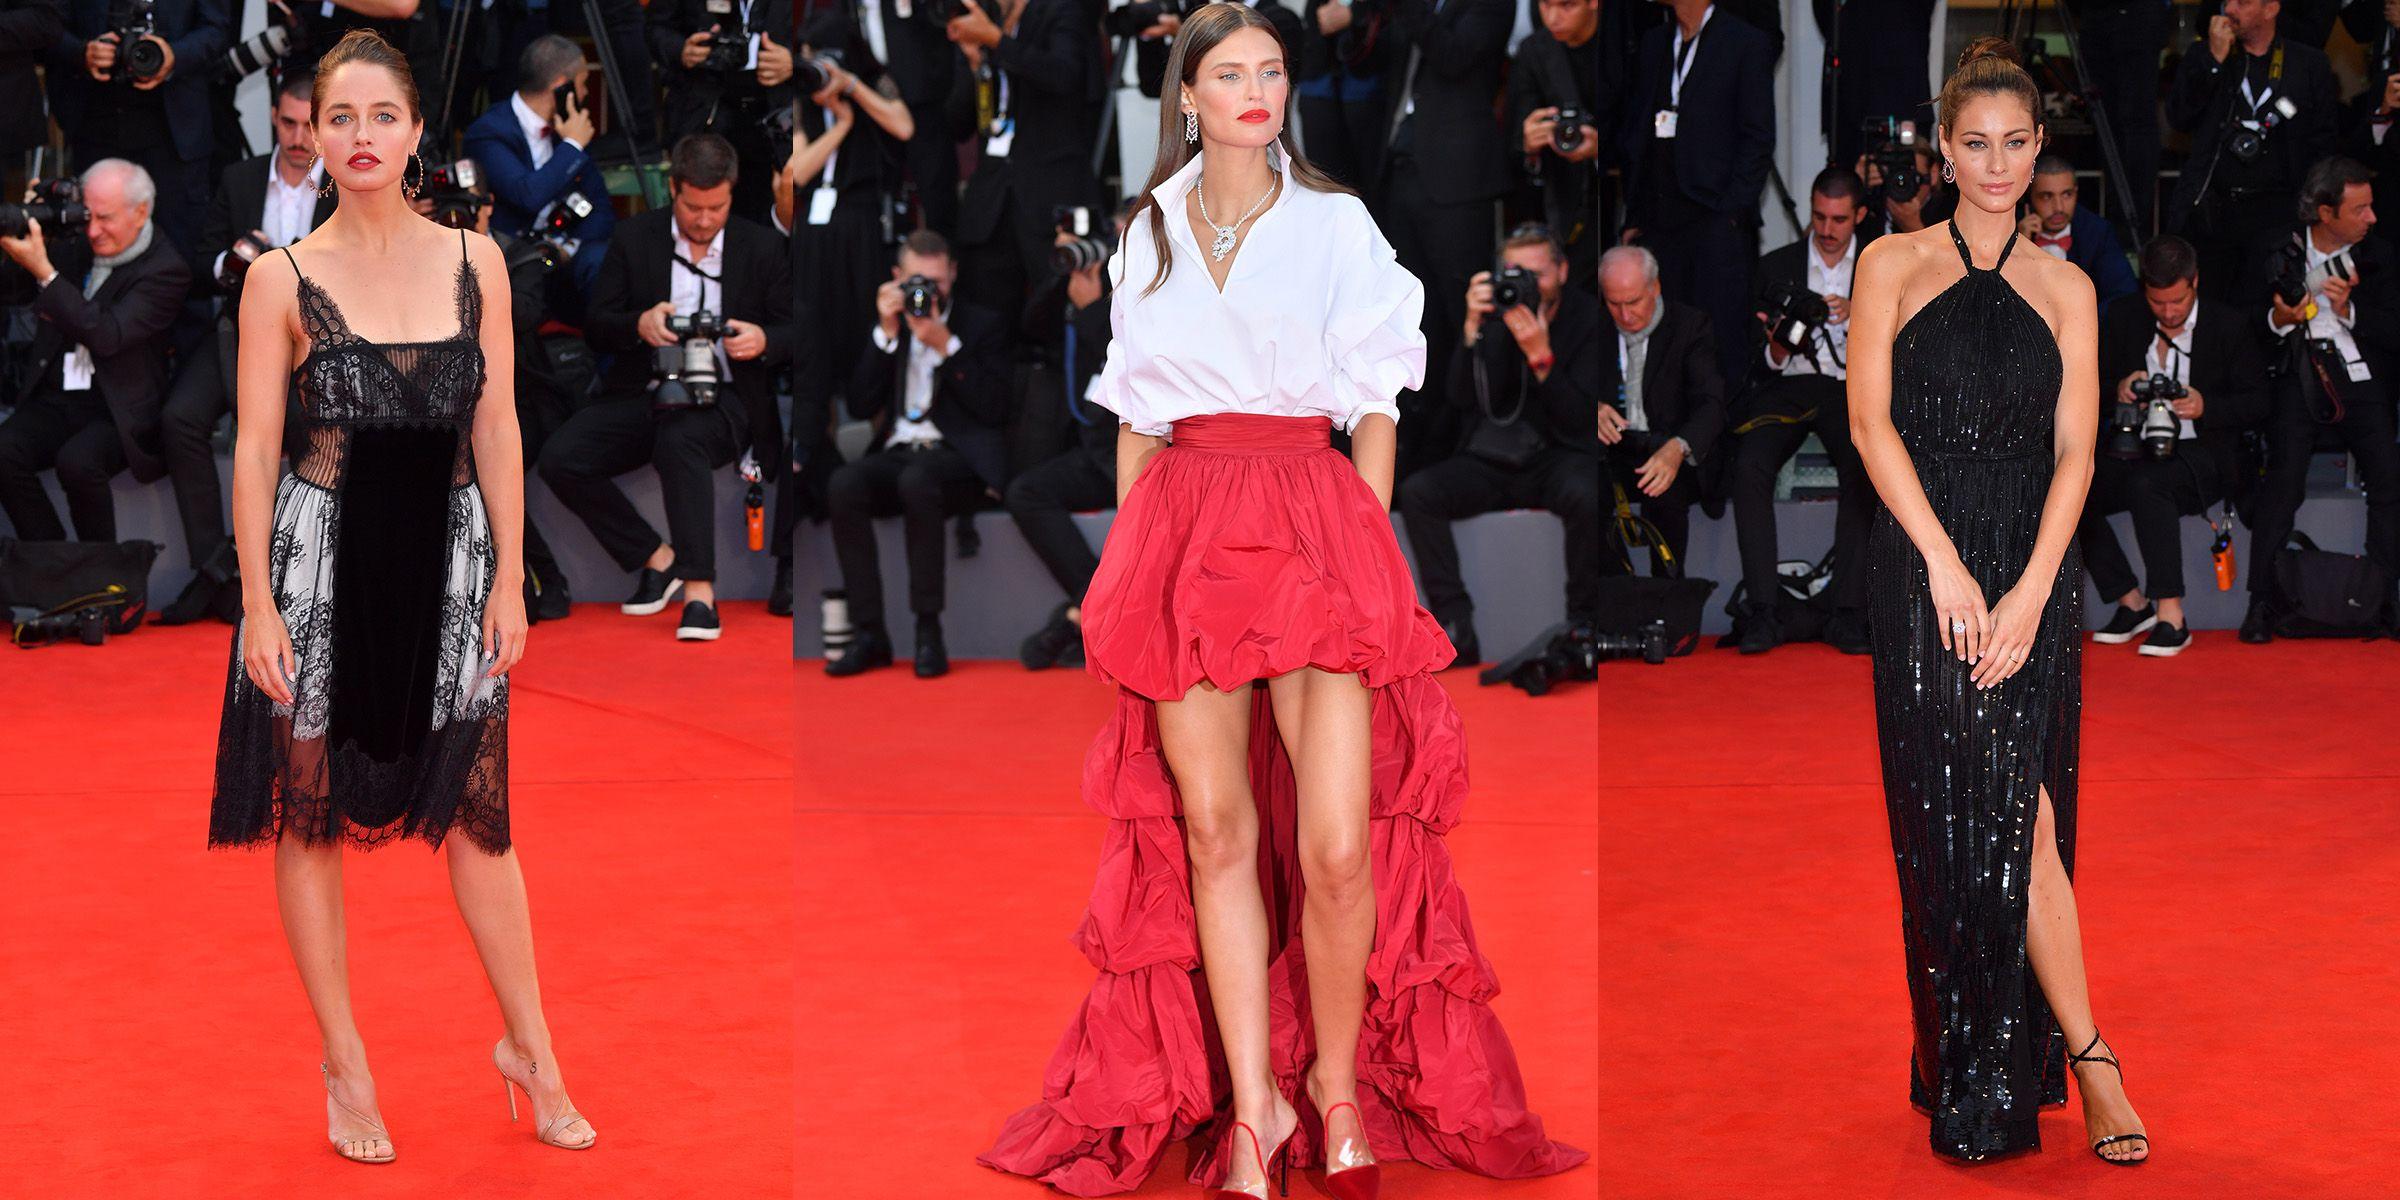 mostra-cinema-venezia-2018-star-look